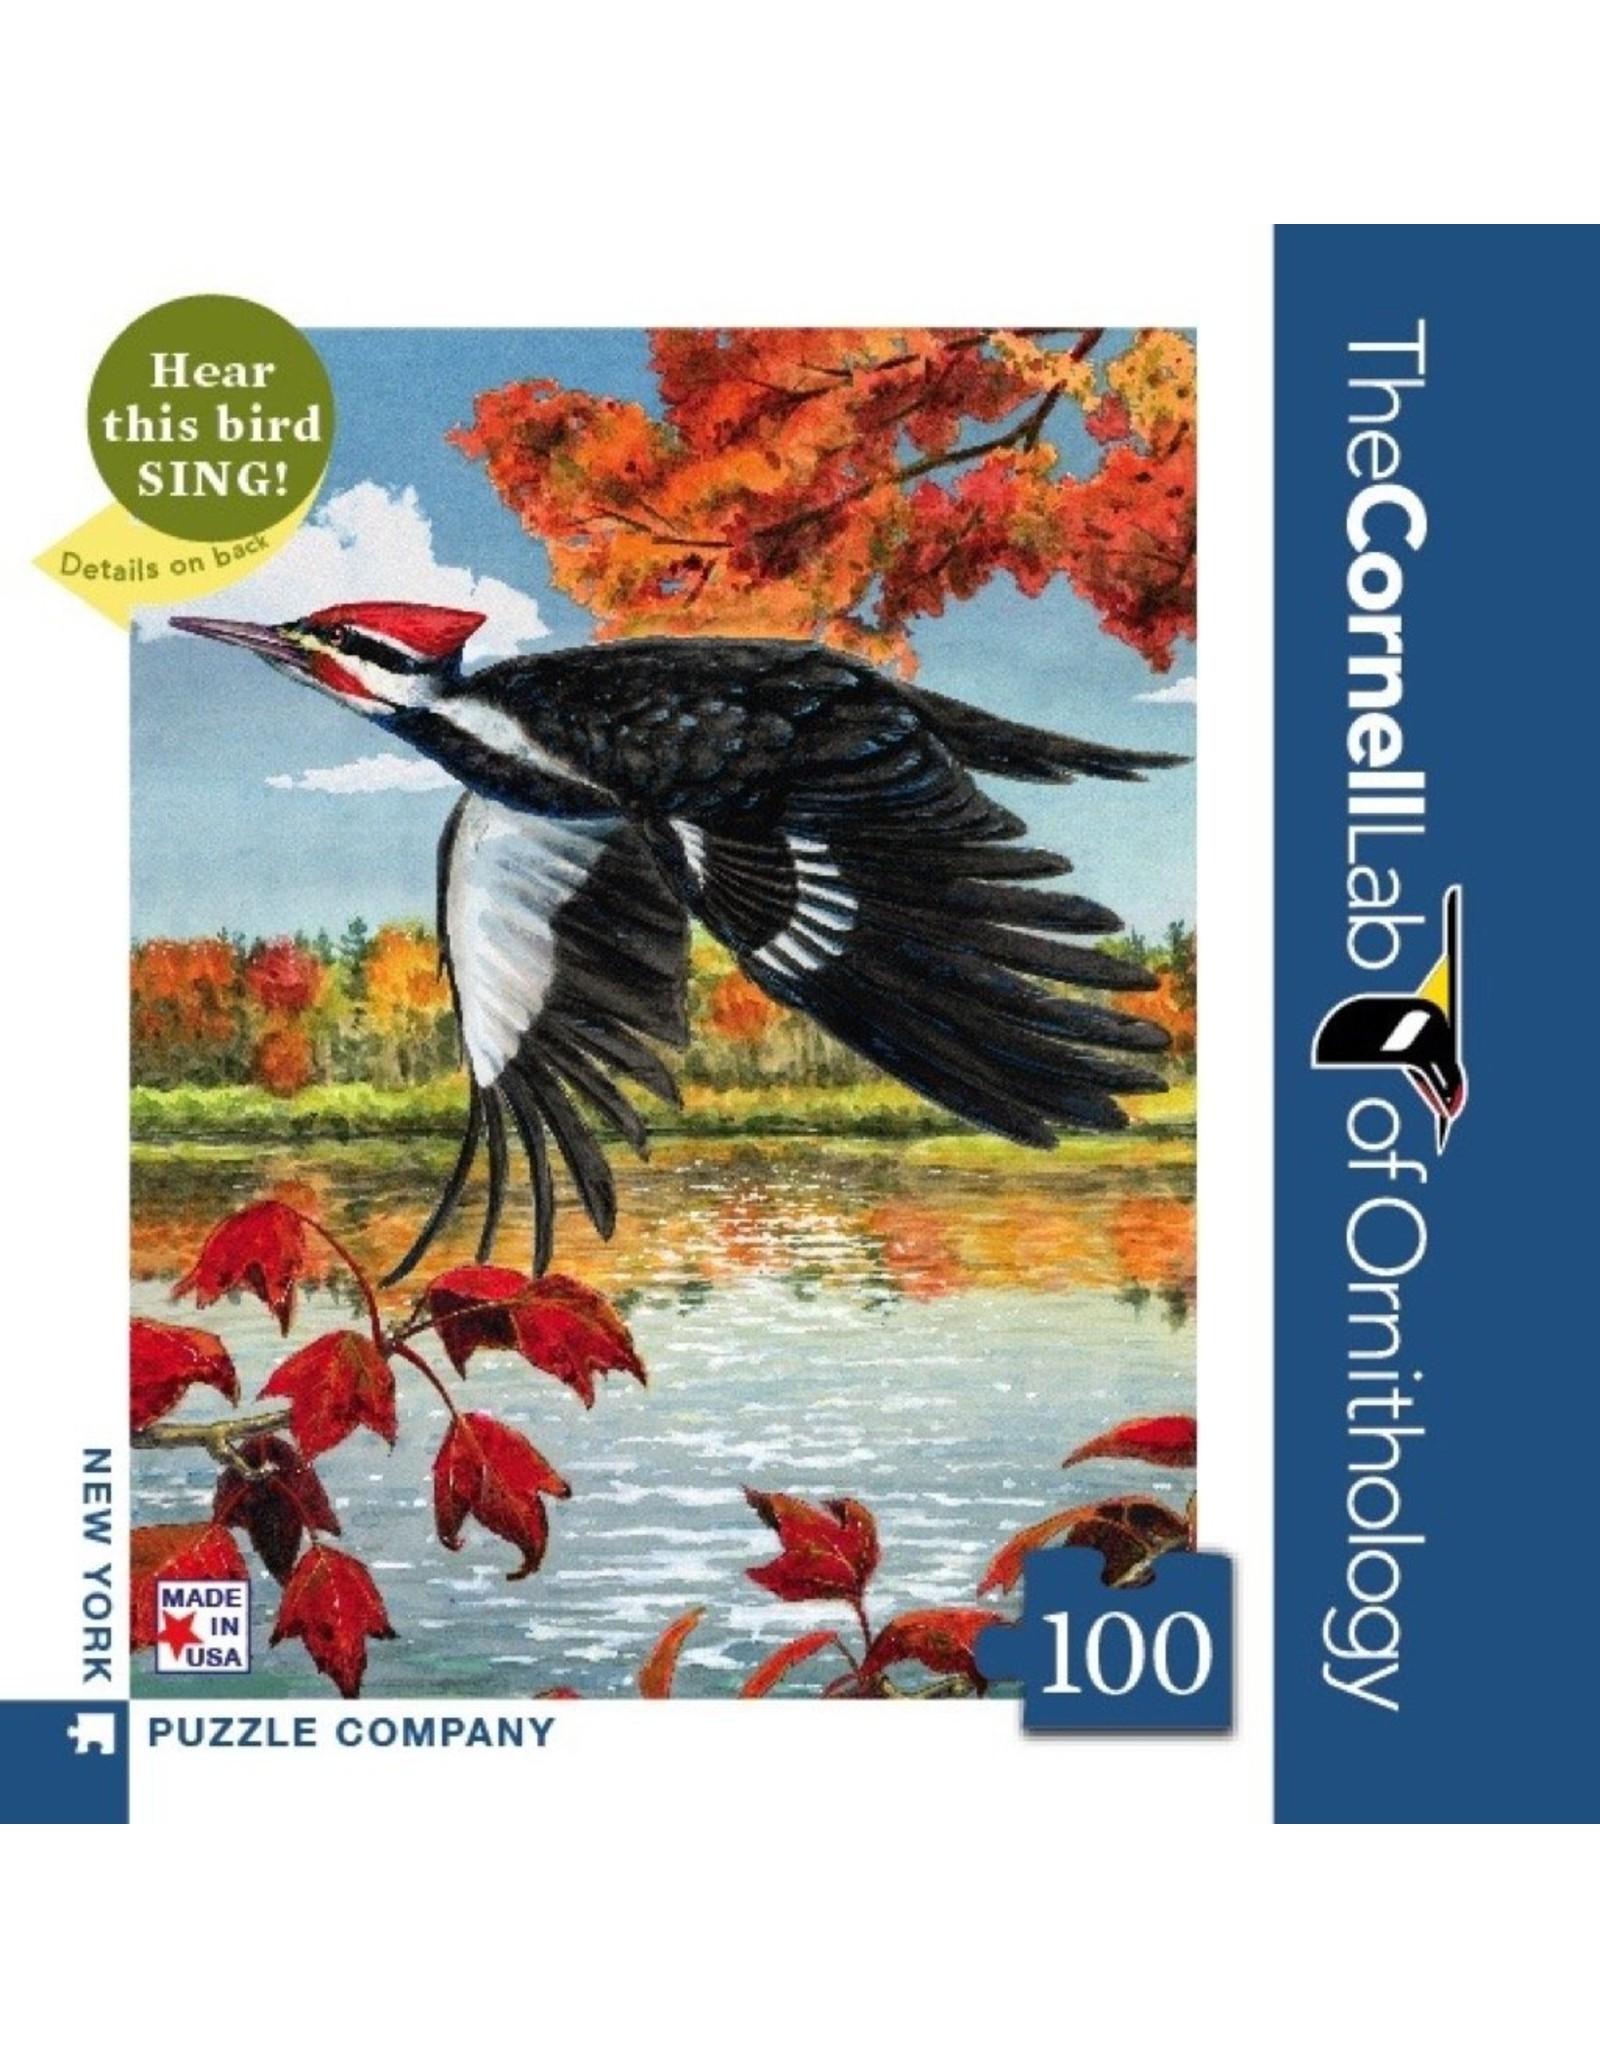 NLE - Mini Puzzle Pileated Woodpecker / 100pcs